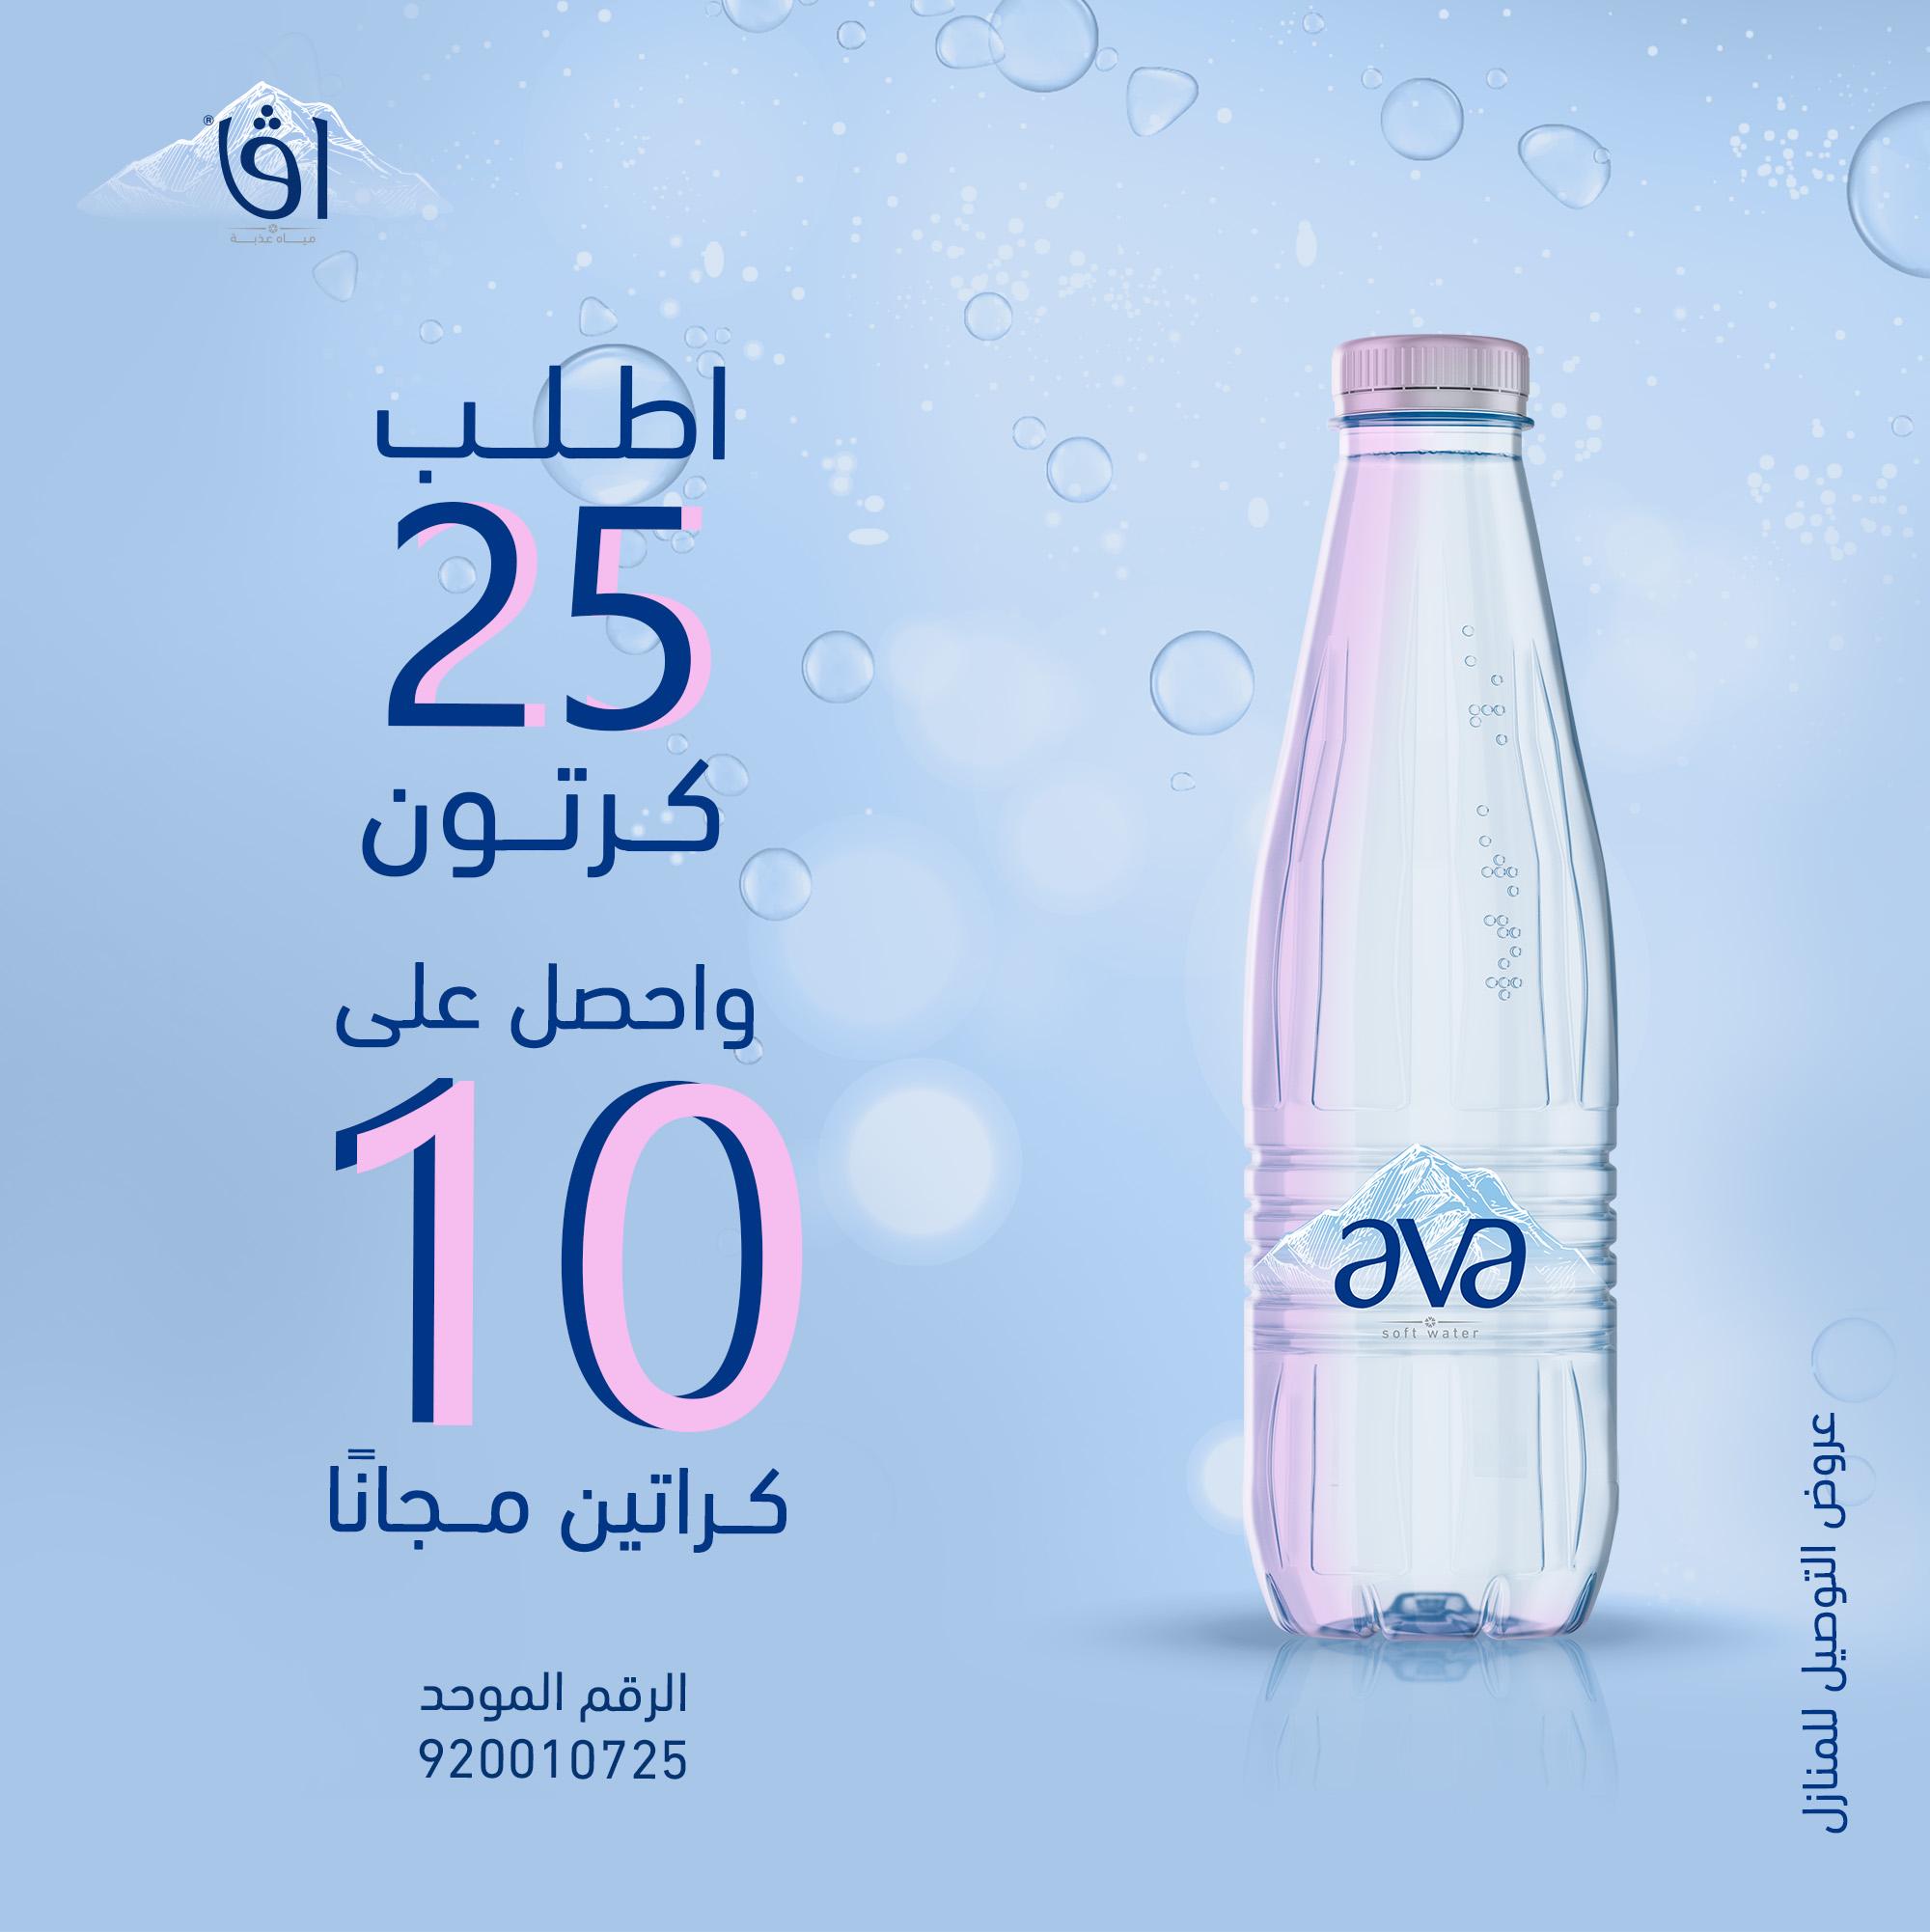 Ava Water مياه اڤا On Twitter مياه اڤا تنسيك الصيف اطلب 25 كرتون ويصلك 10 كراتين مجان ا في انتظاركم على الرقم الموحد 920010725 توصيل مياه مجانا اطلب Https T Co Hpx57xhogs